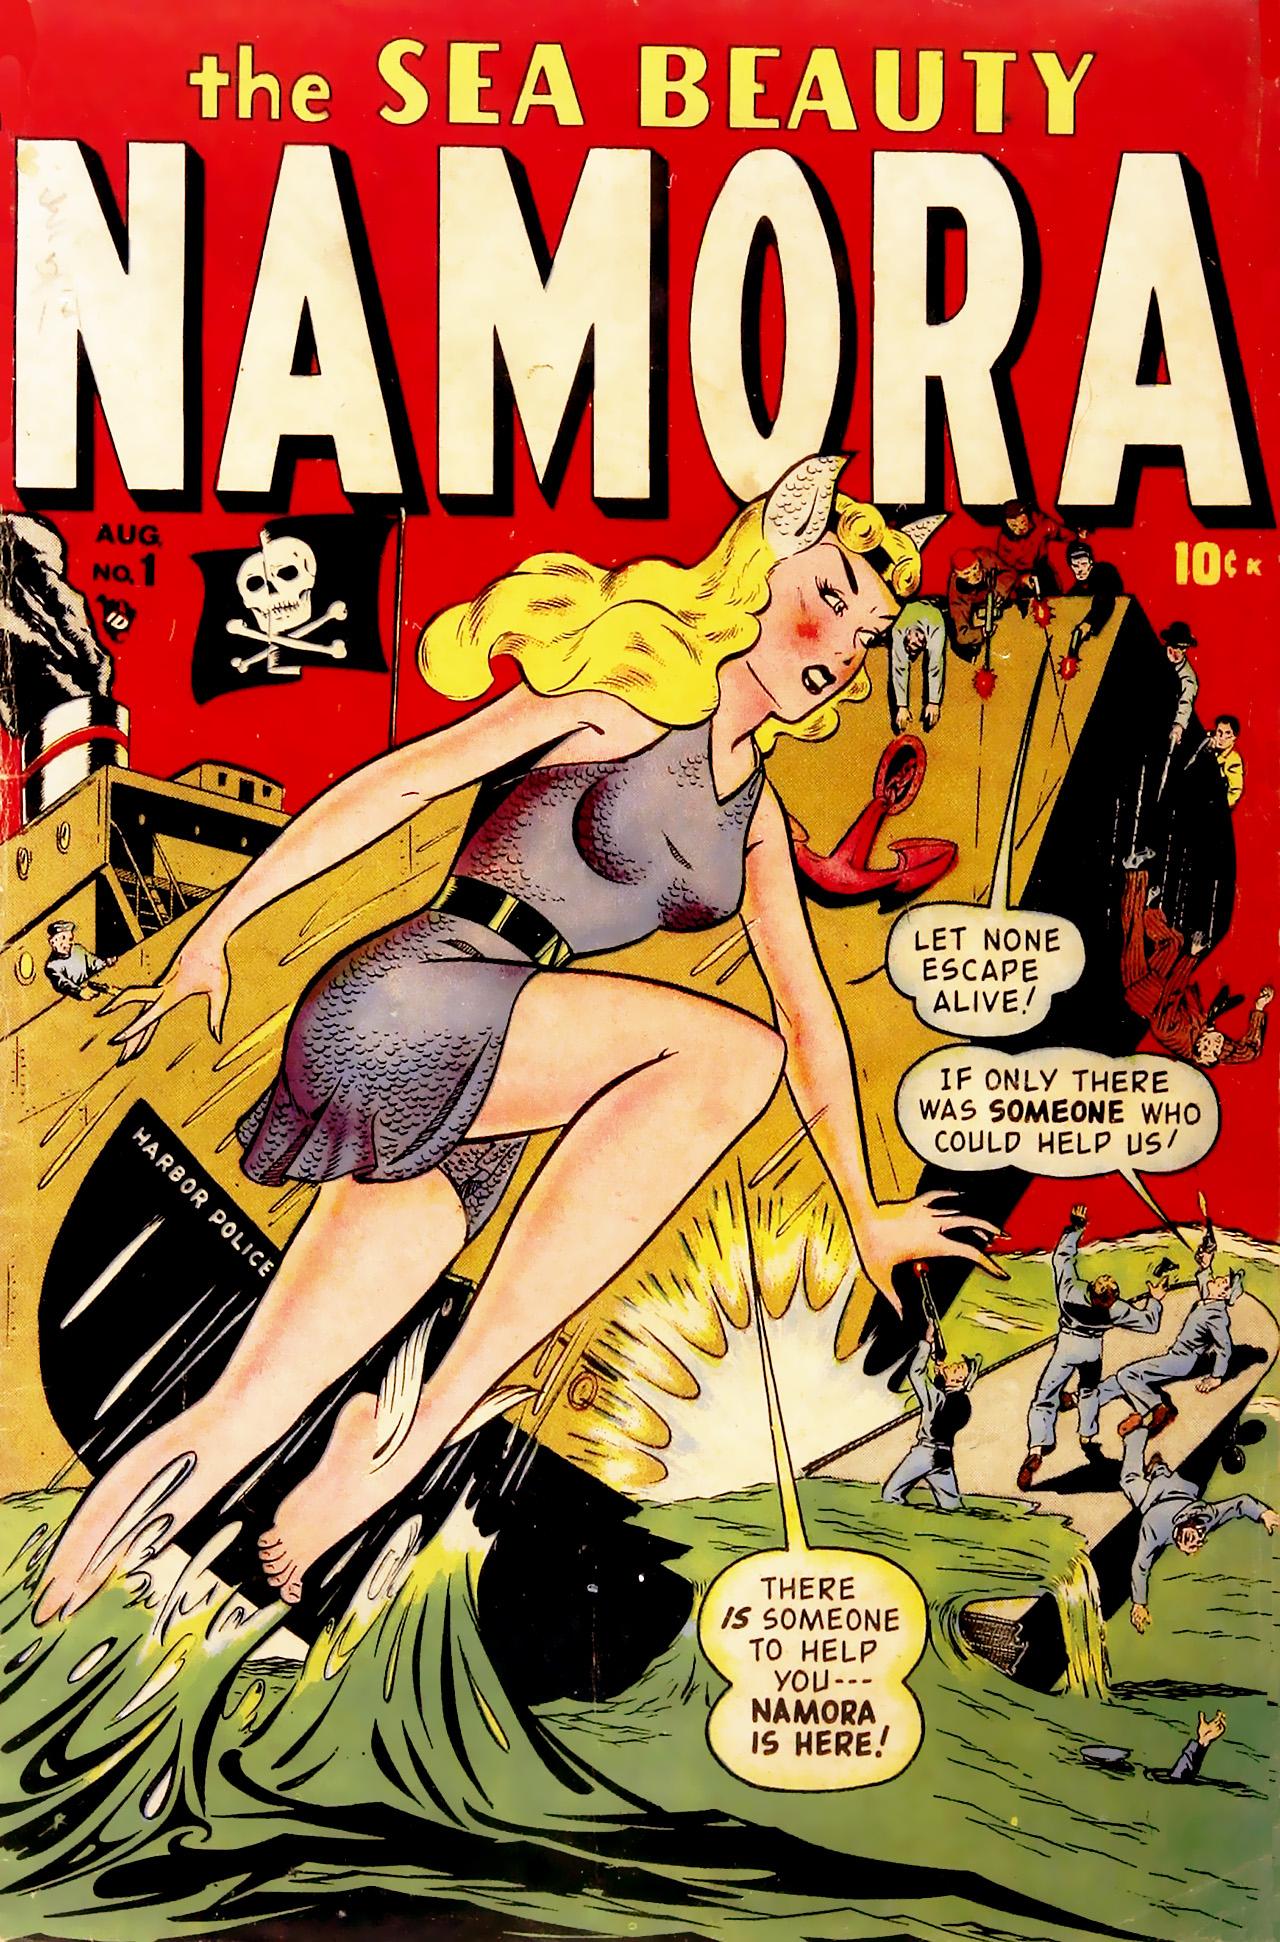 Namora (1948) #1, cover by Ken Bald.